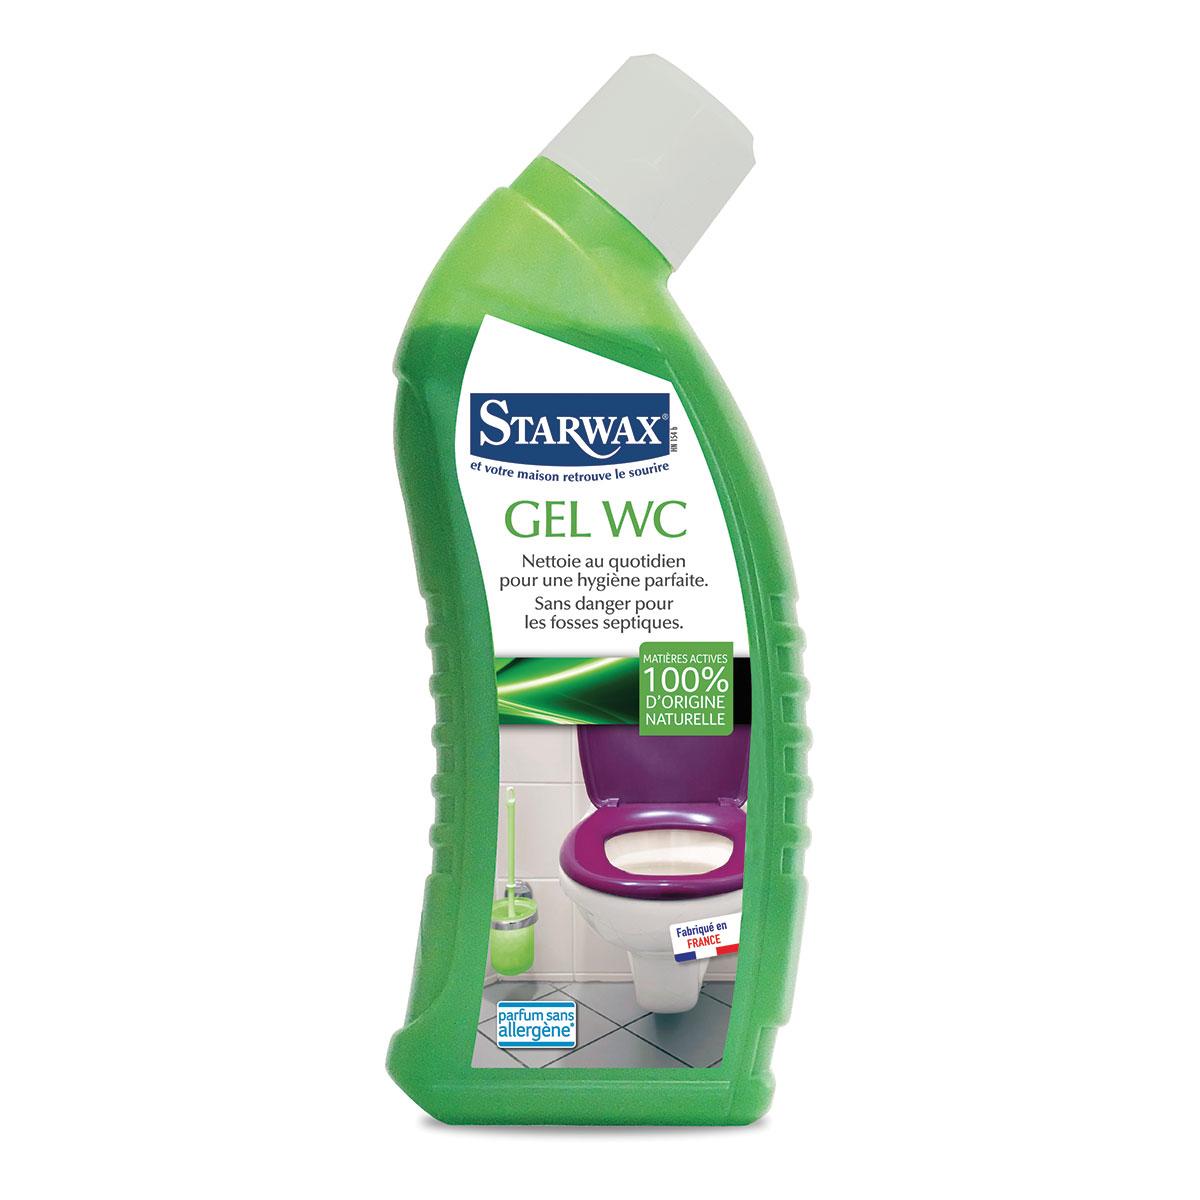 Gel WC avec matières actives 100% d'origine naturelle - Starwax